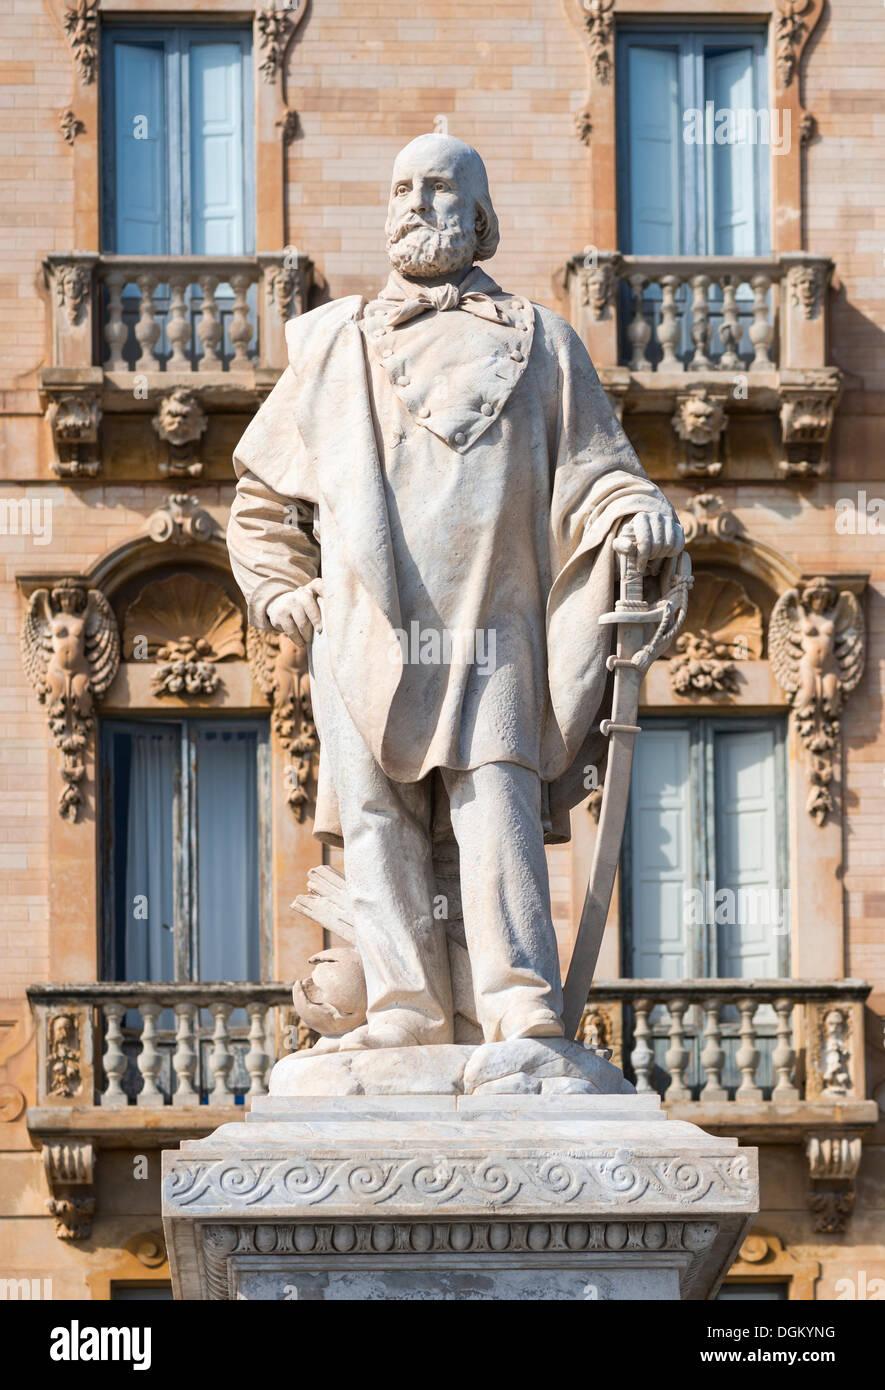 Monument to Giuseppe Garibaldi, Viale Regina Elena, Trapani, Trapani, Province of Trapani, Sicily, Italy - Stock Image